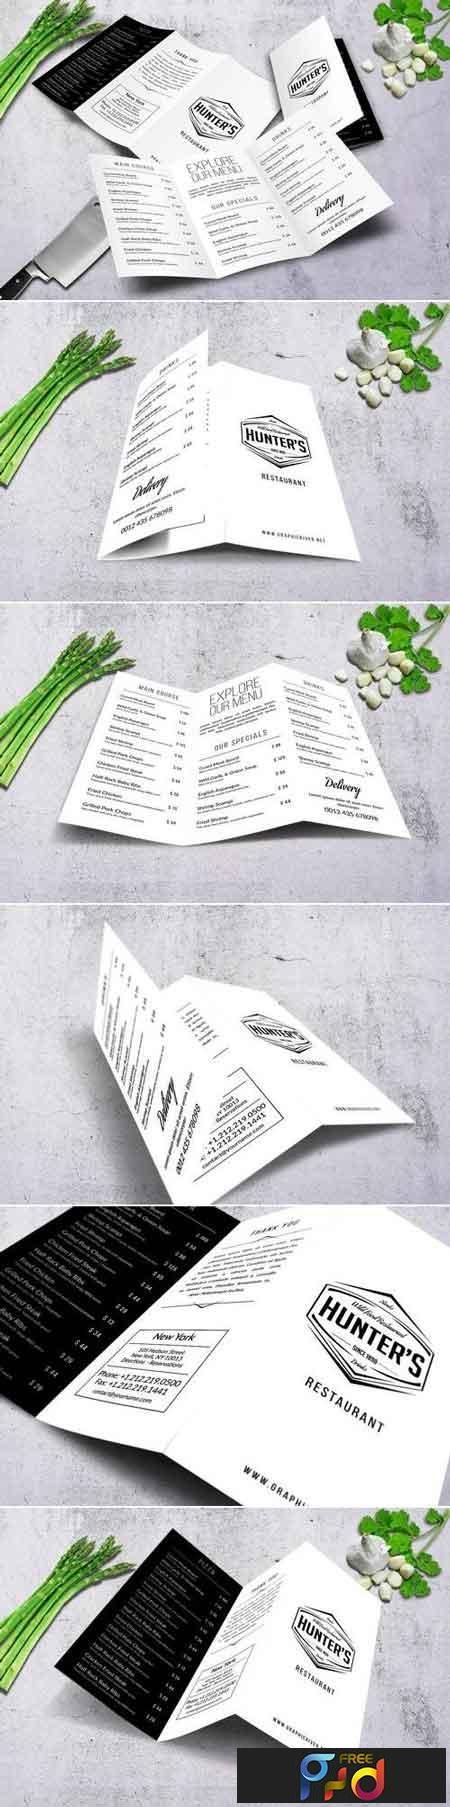 Minimal A4 Trifold Food Menu Design 1